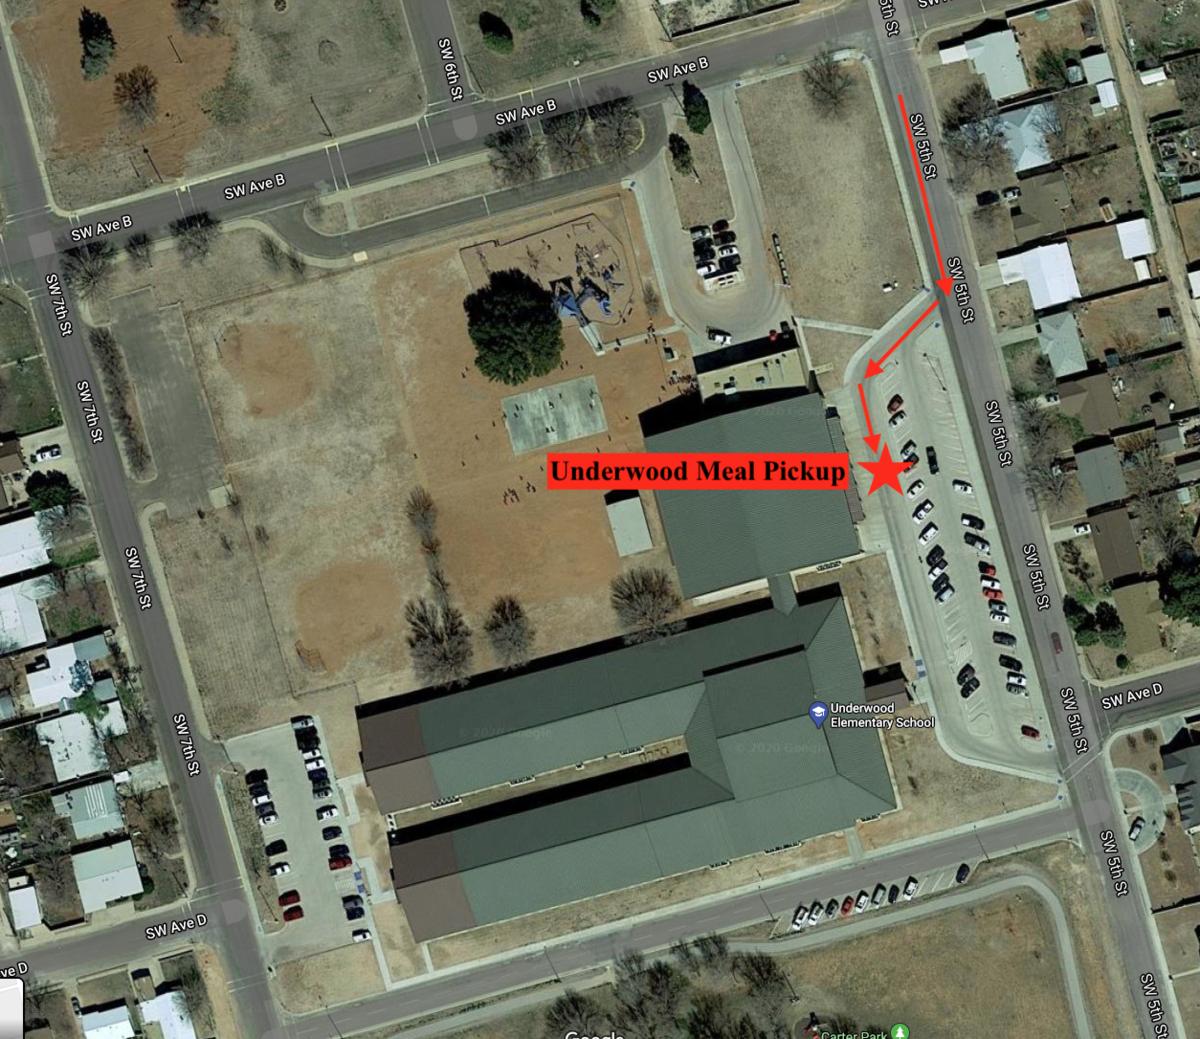 Underwood pick up location